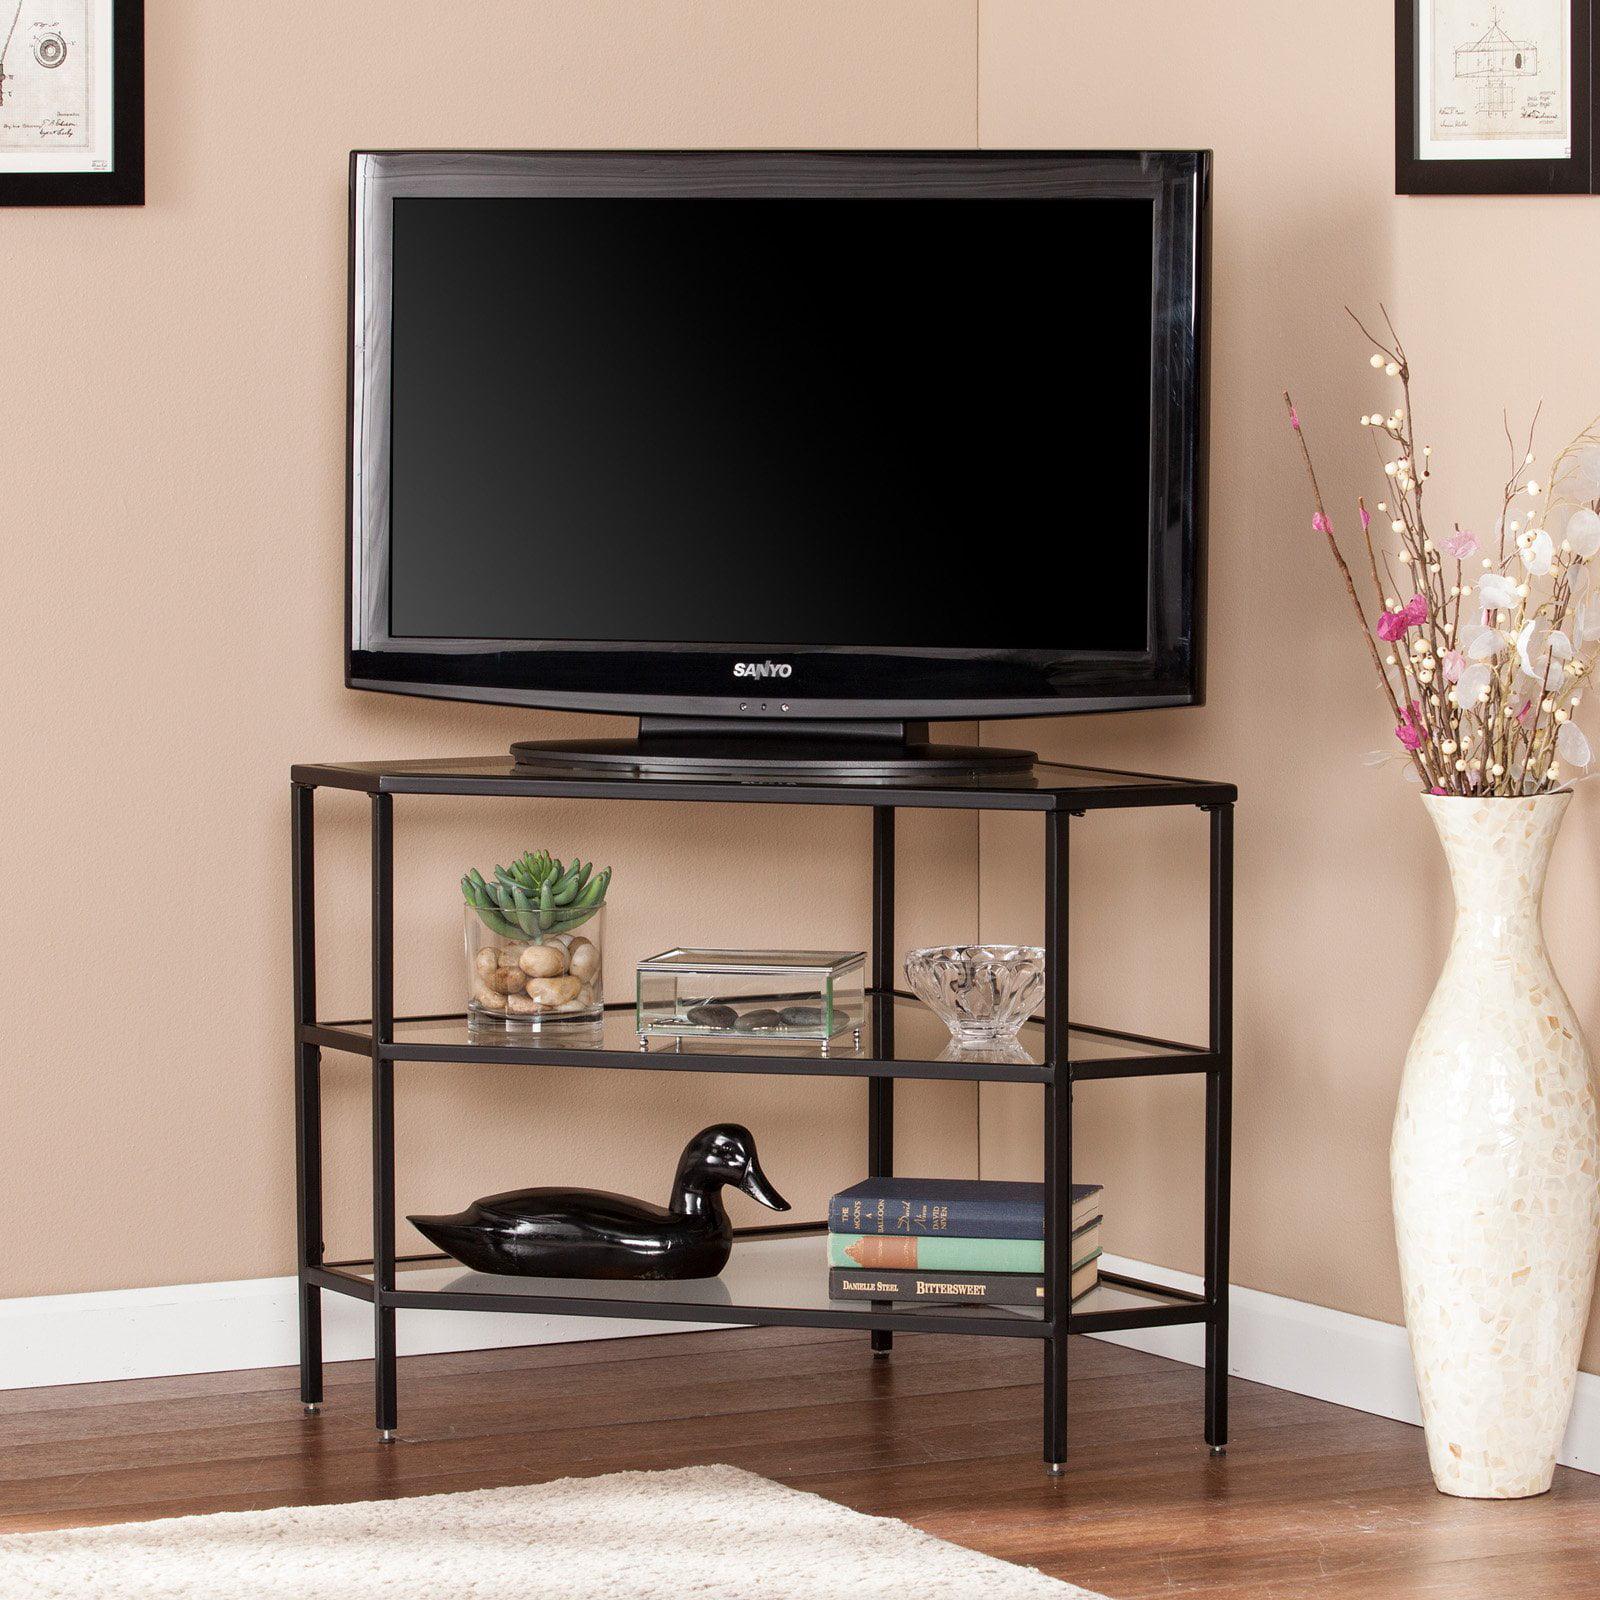 Southern Enterprises Niles Metal / Glass Corner TV Stand - Black